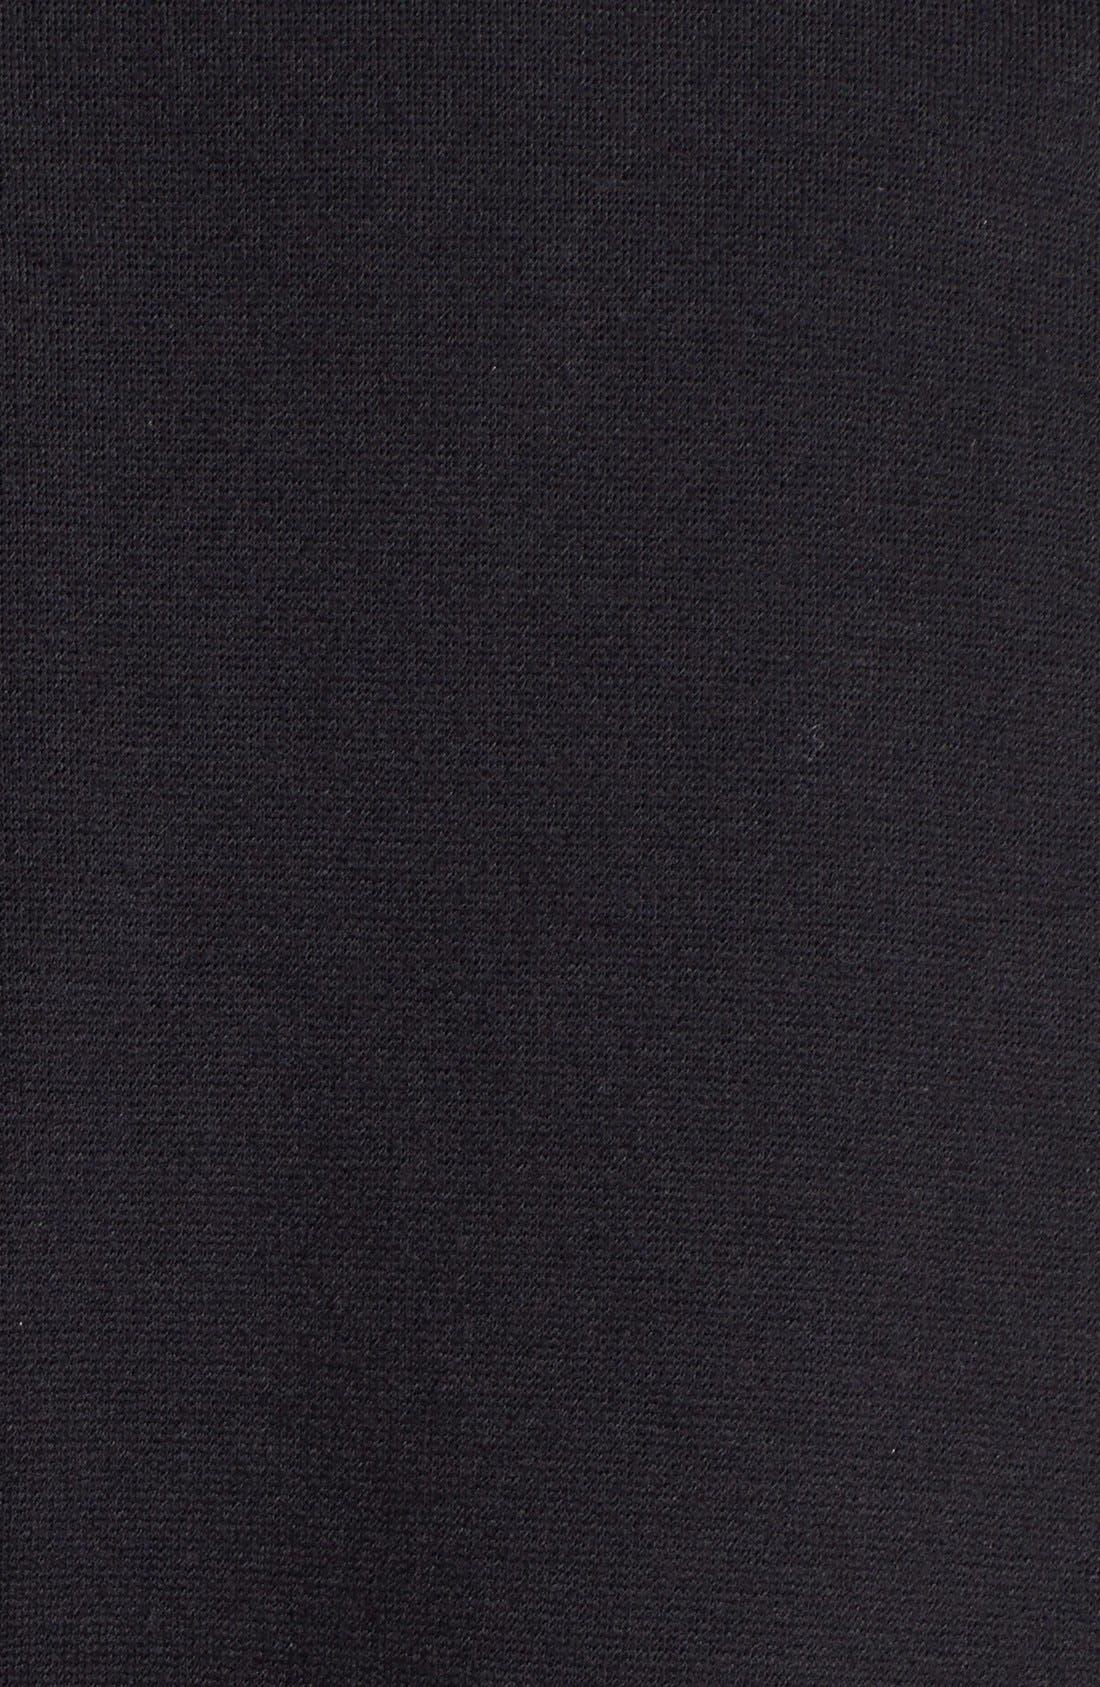 Alternate Image 3  - Vince Camuto Faux Calf Hair & Ponte Knit Jacket